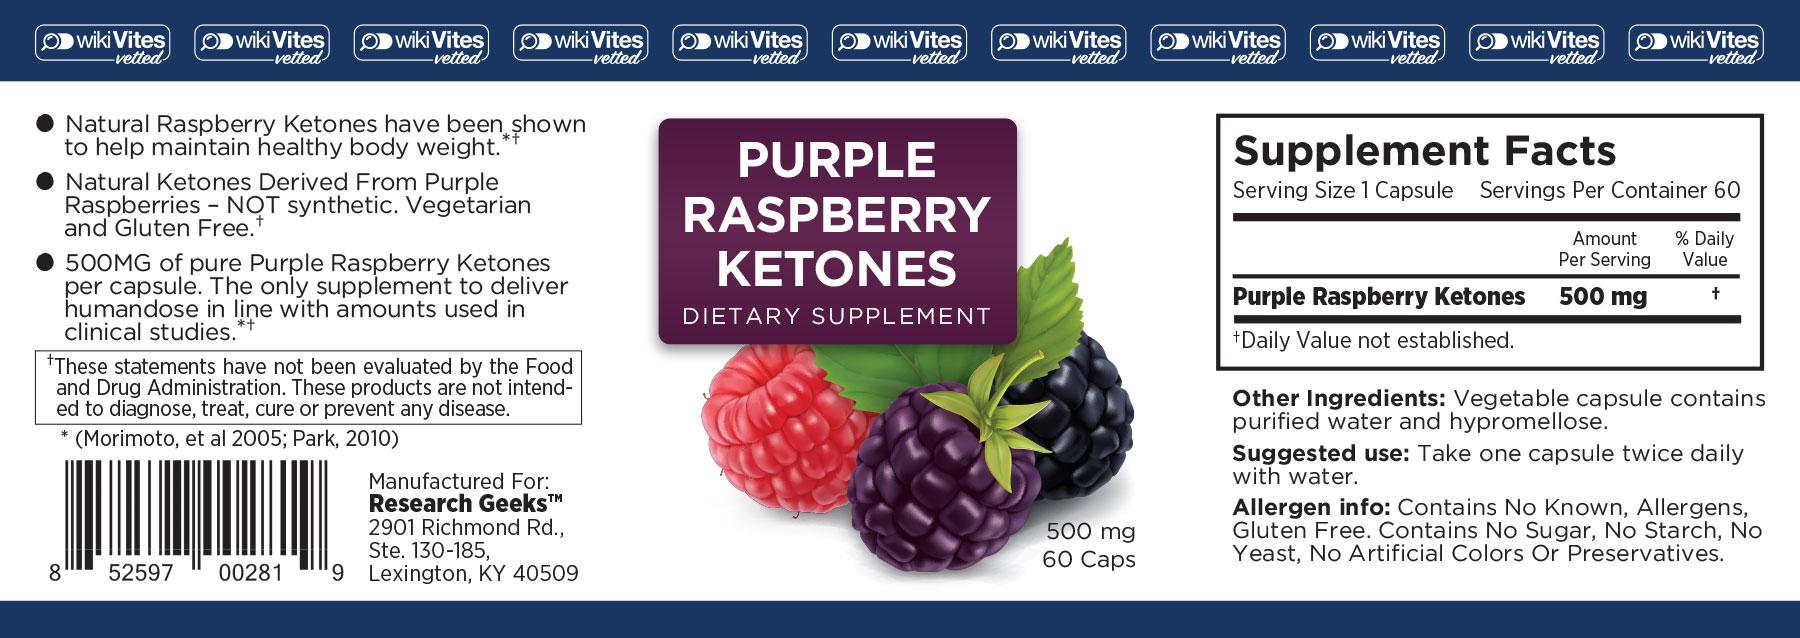 Purple Raspberry Ketones